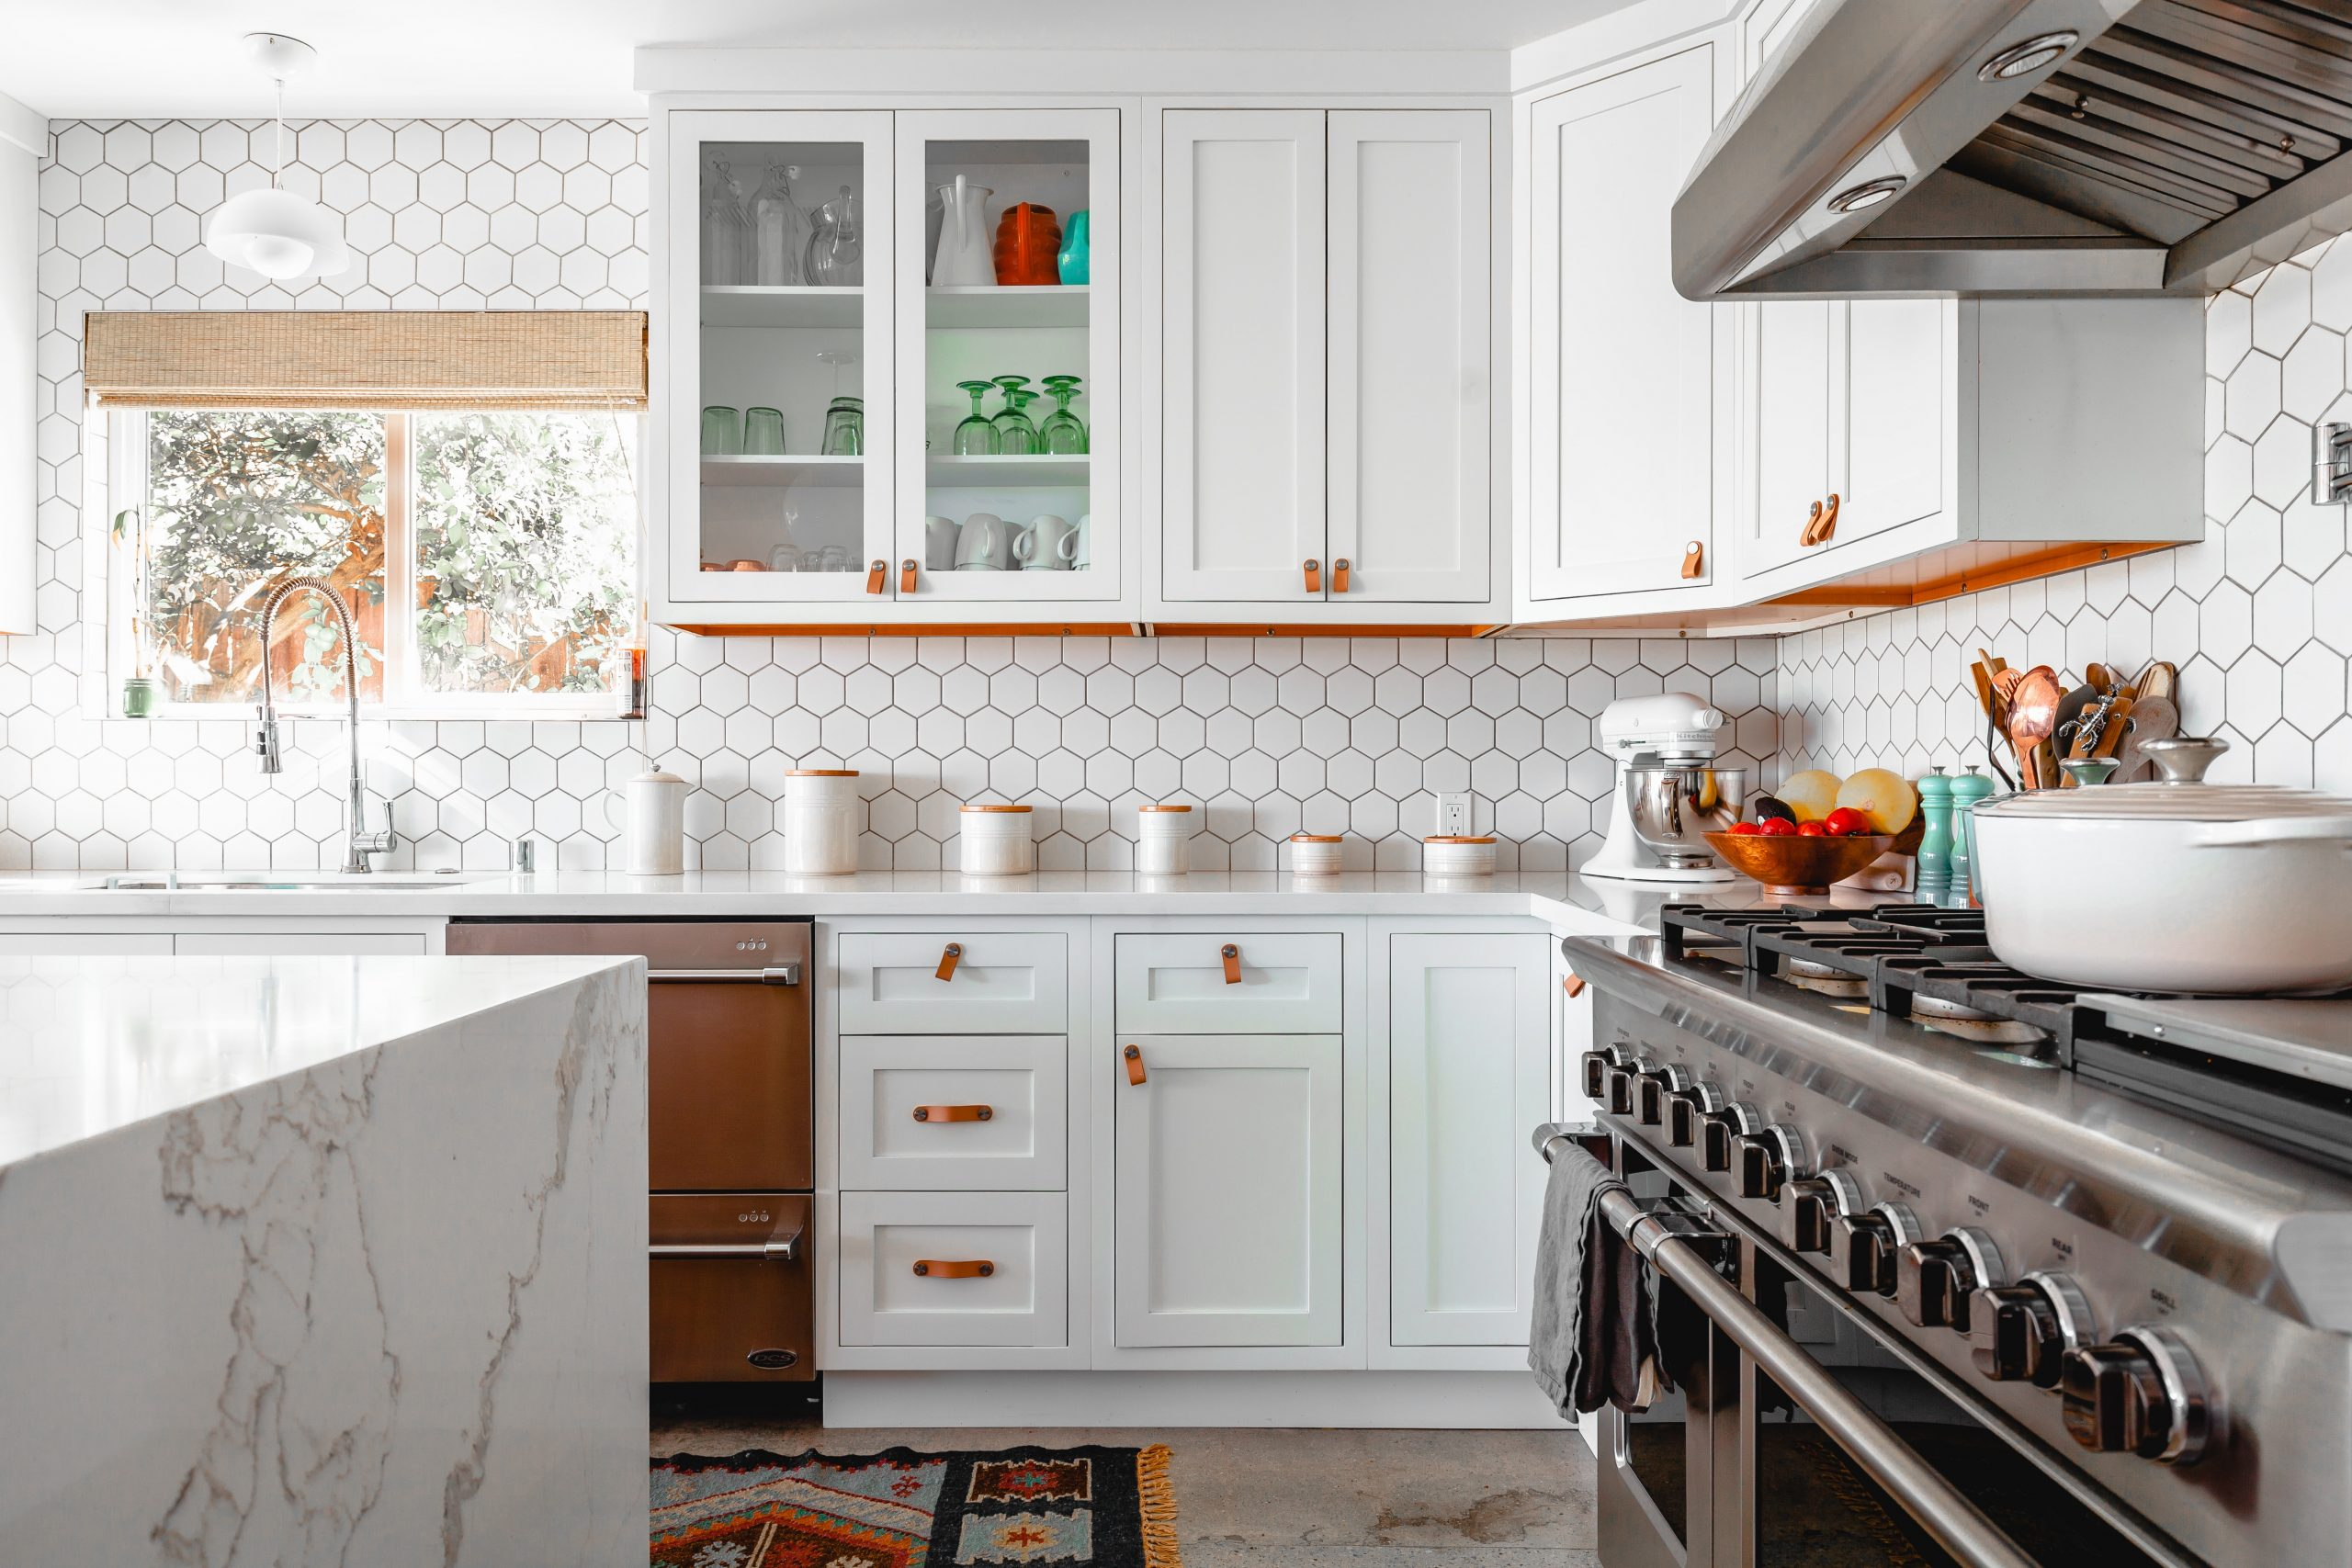 15 simple hacks to create a minimalist kitchen pretty on 91 Comfortable Kitchen Design Tips 2020 id=12190